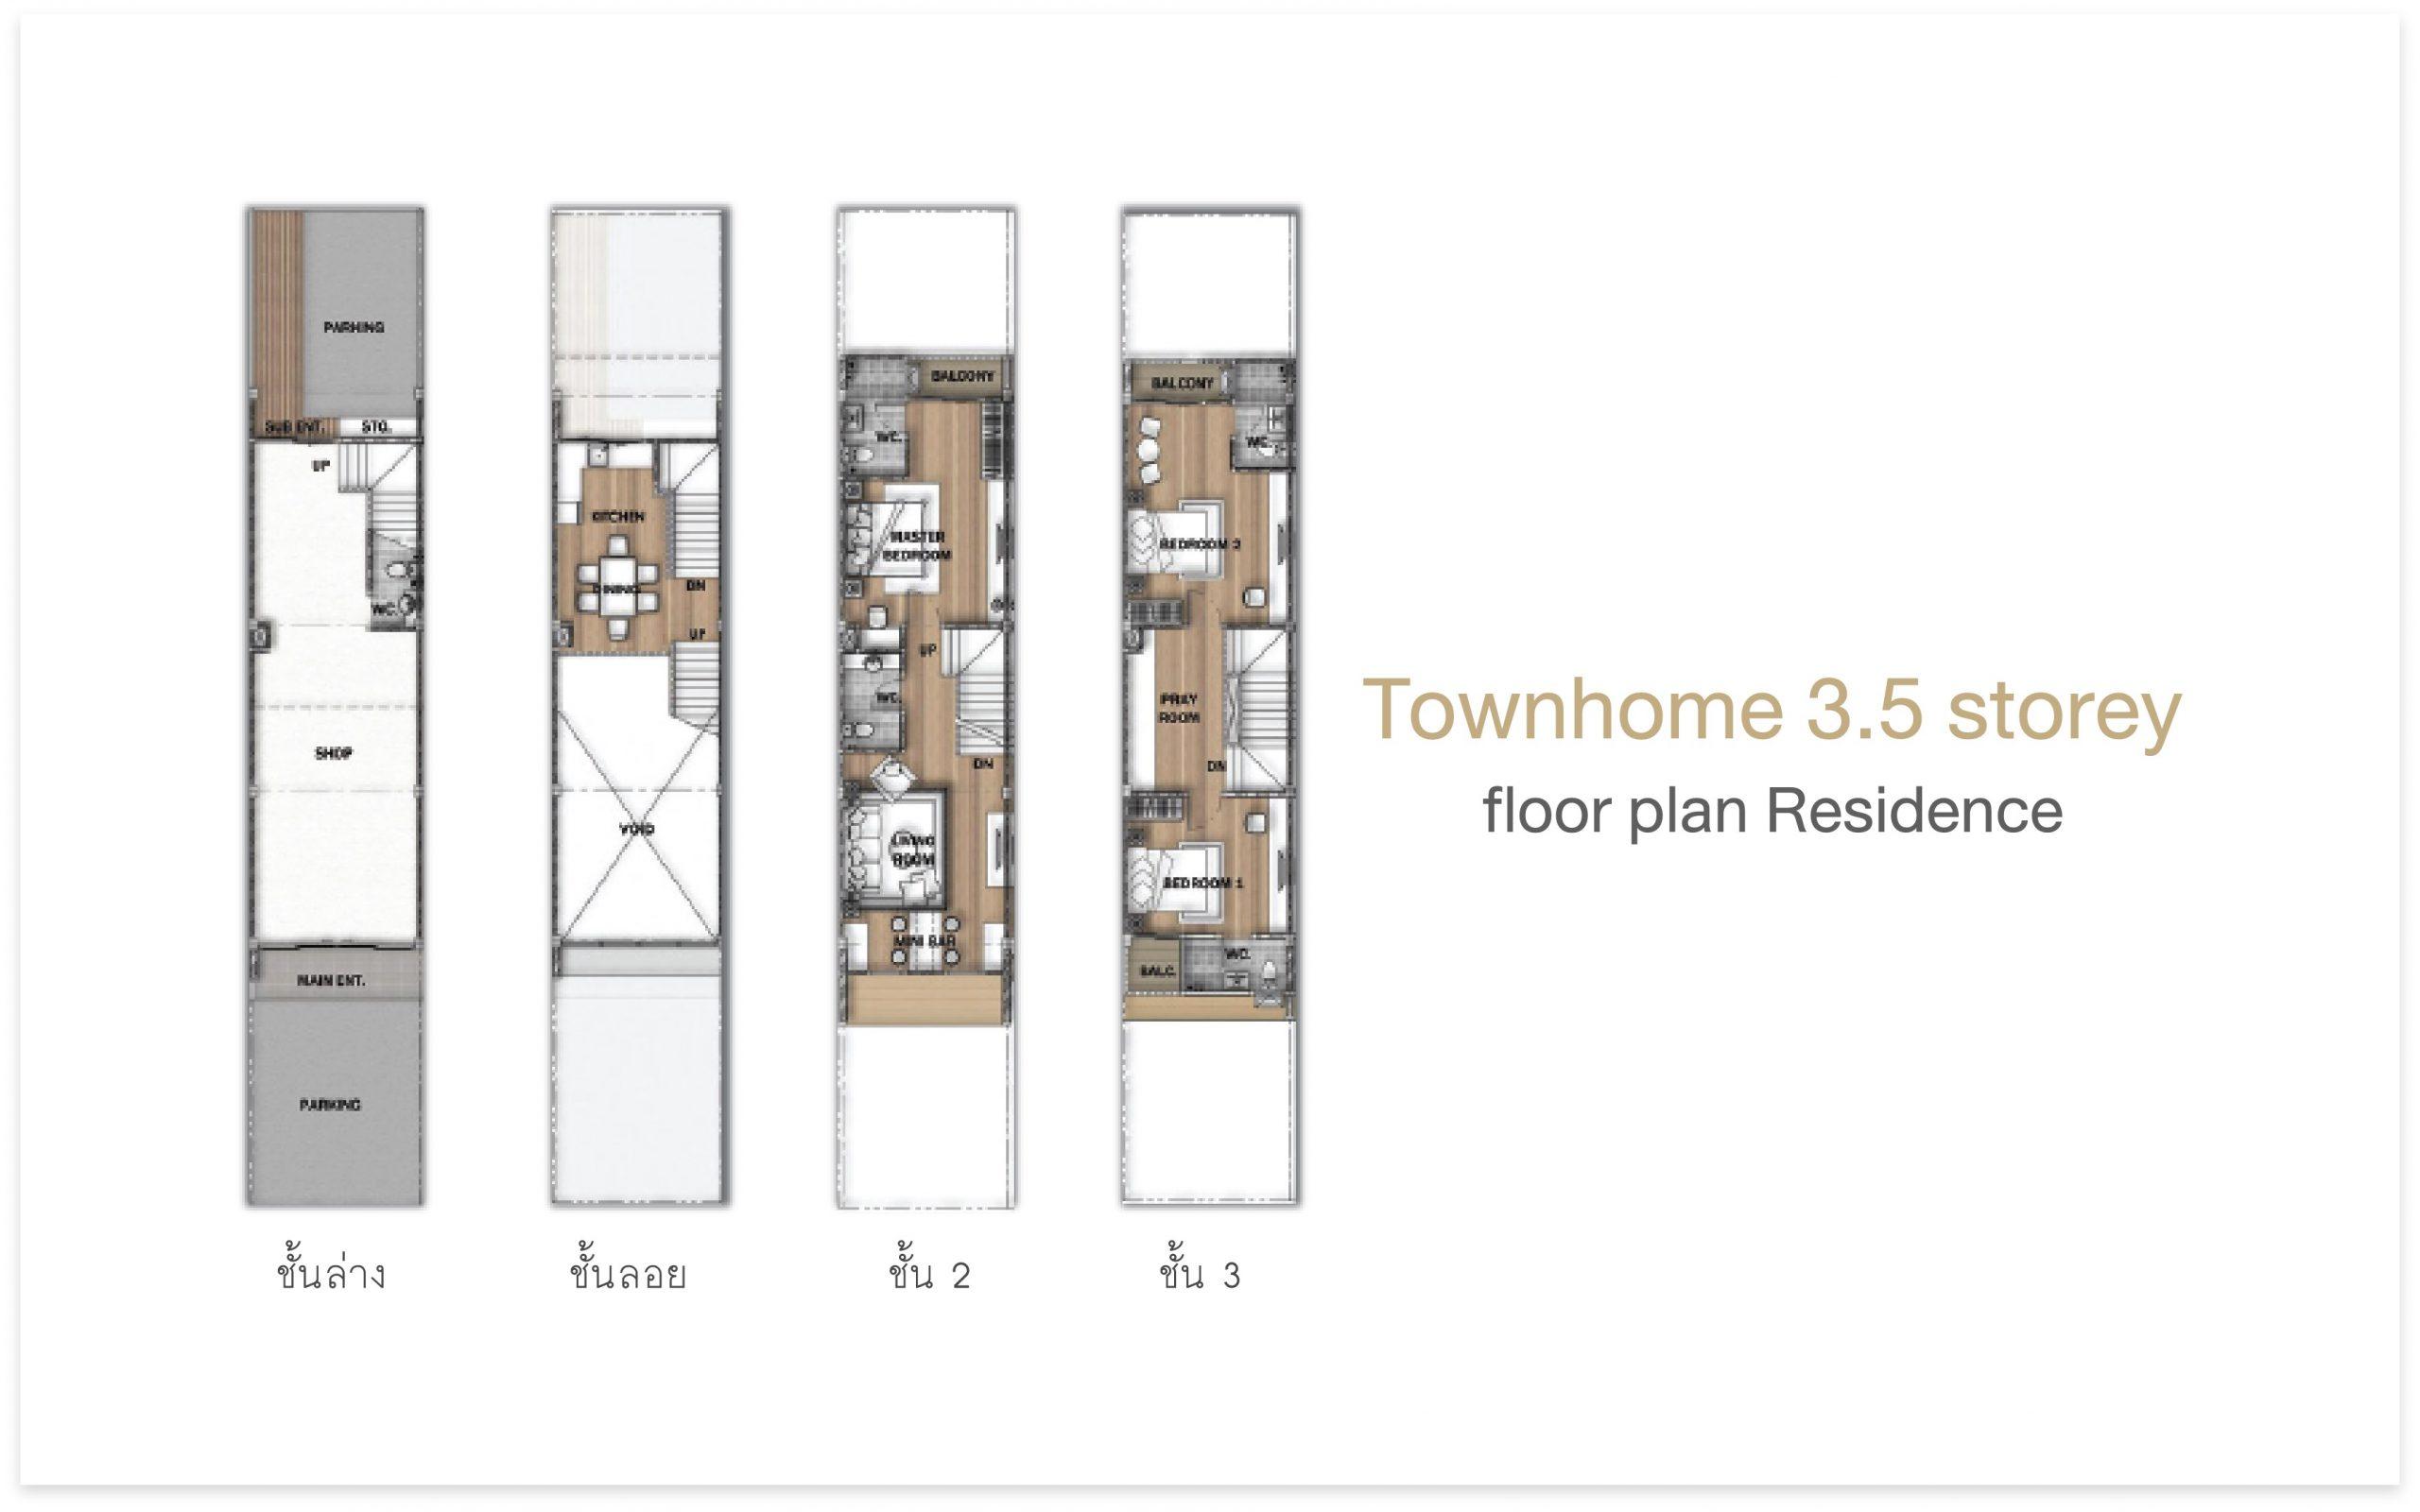 plan-townhome-3-5